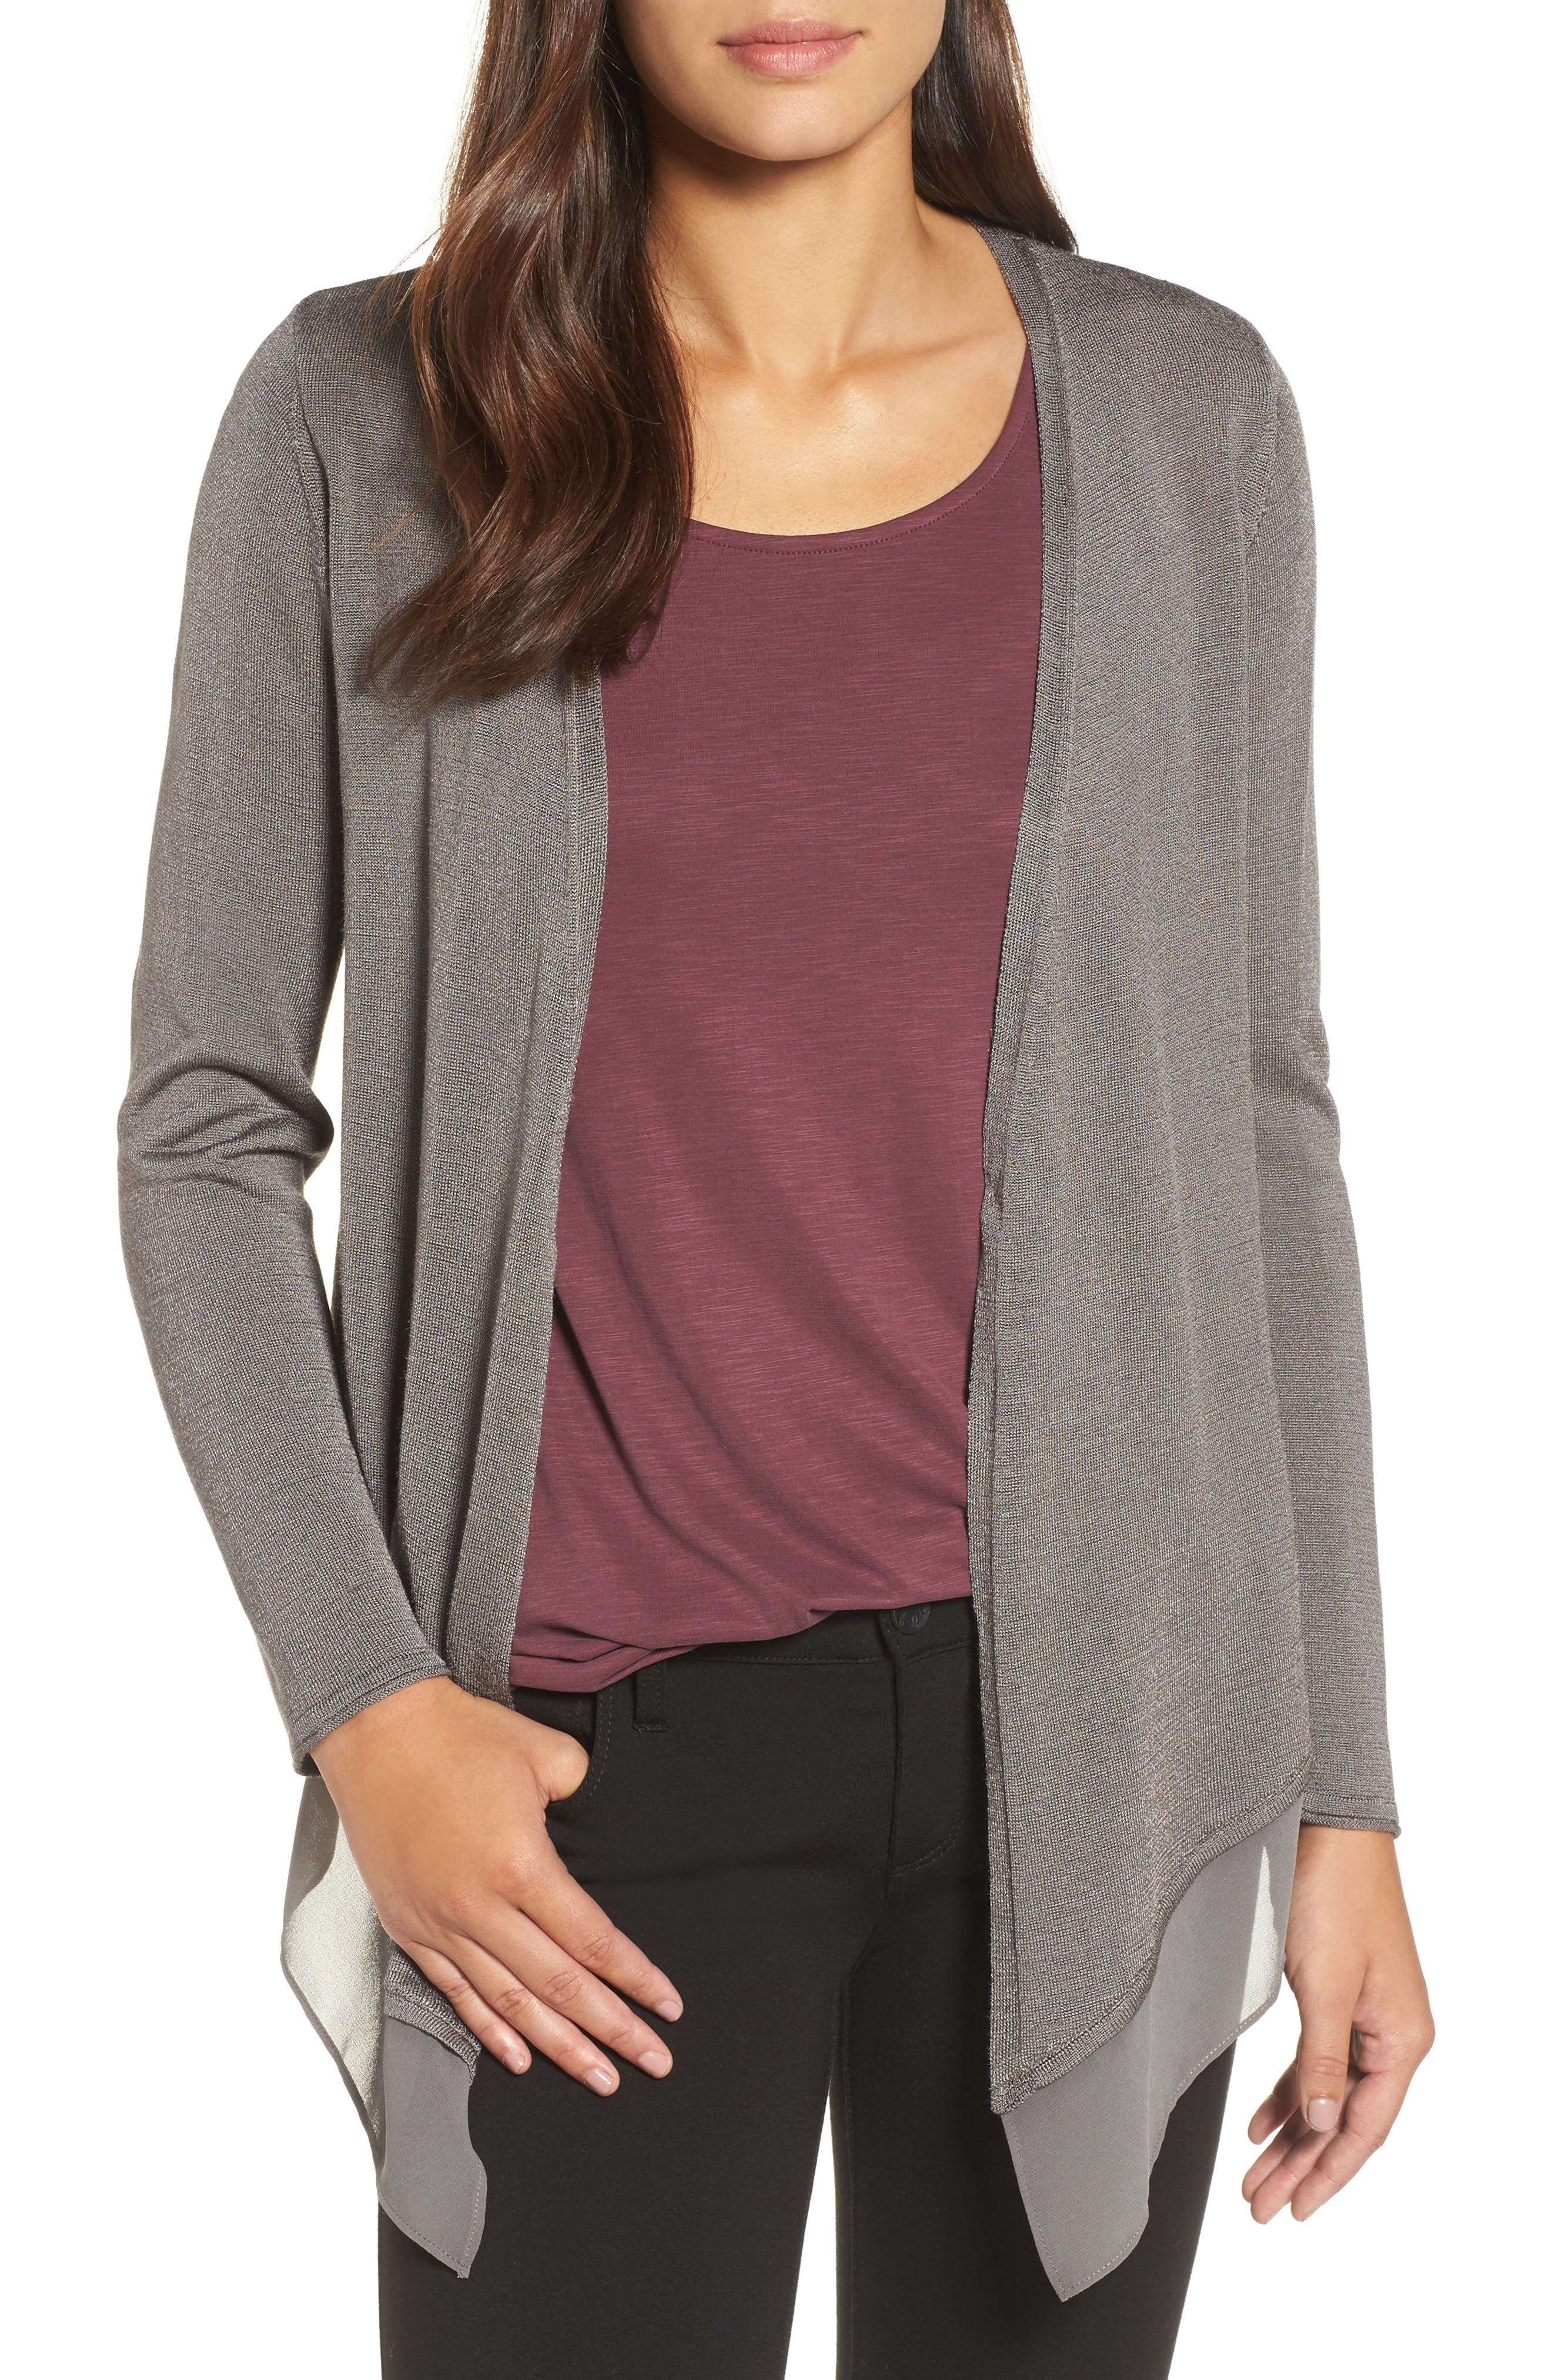 Alternate Image 1 Selected - NIC+ZOE Paired Up Silk Blend Cardigan (Regular & Petite)